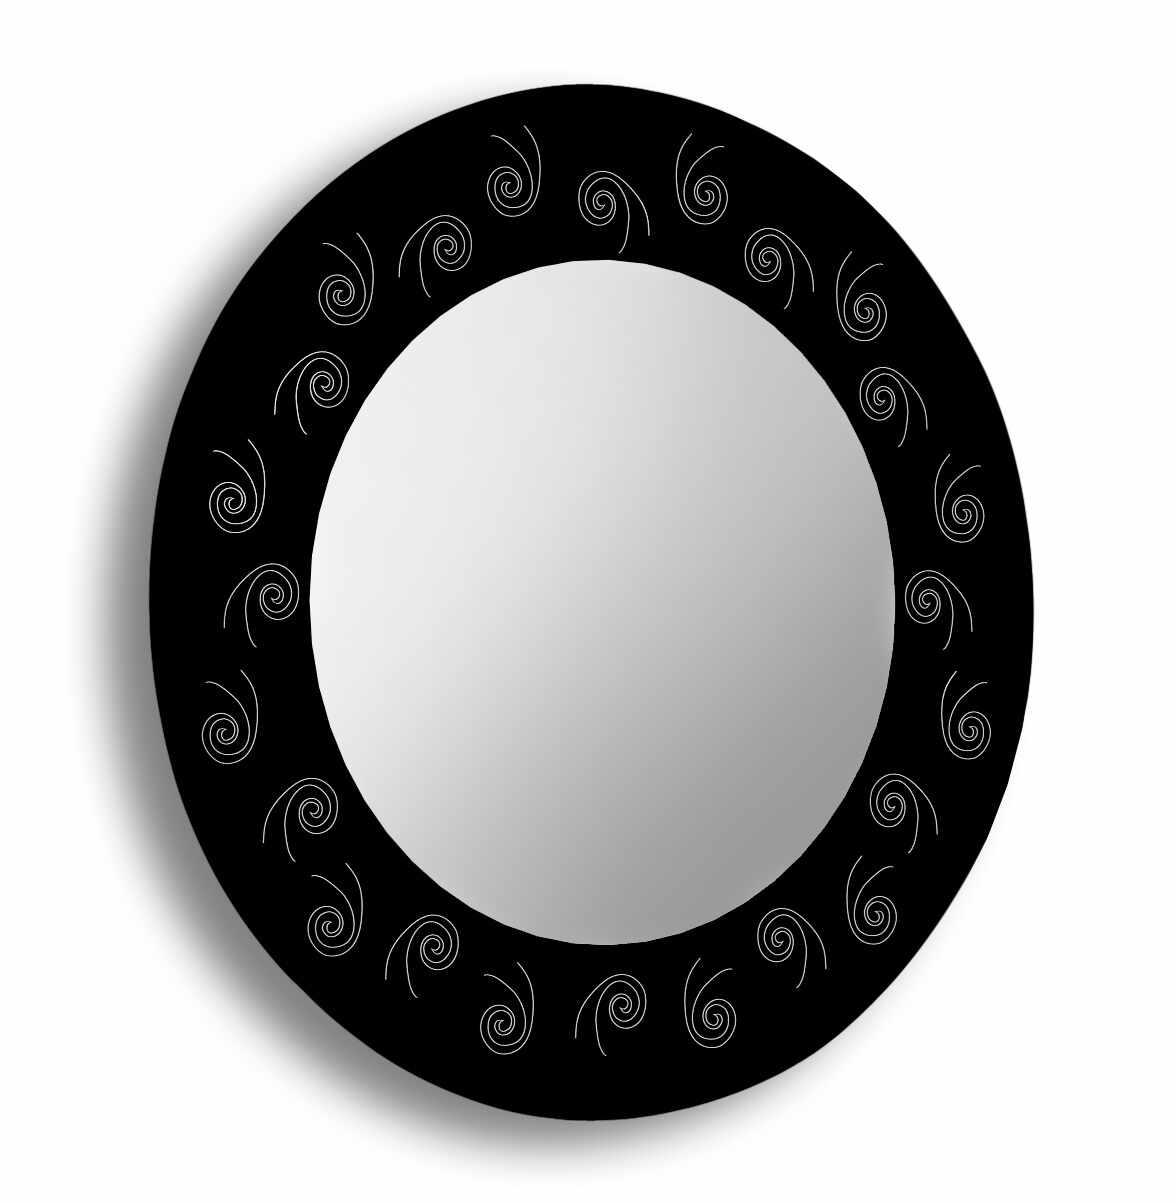 Oglinda baie cu rama printata si sablata Raia 60 cm la pret 289.61 lei